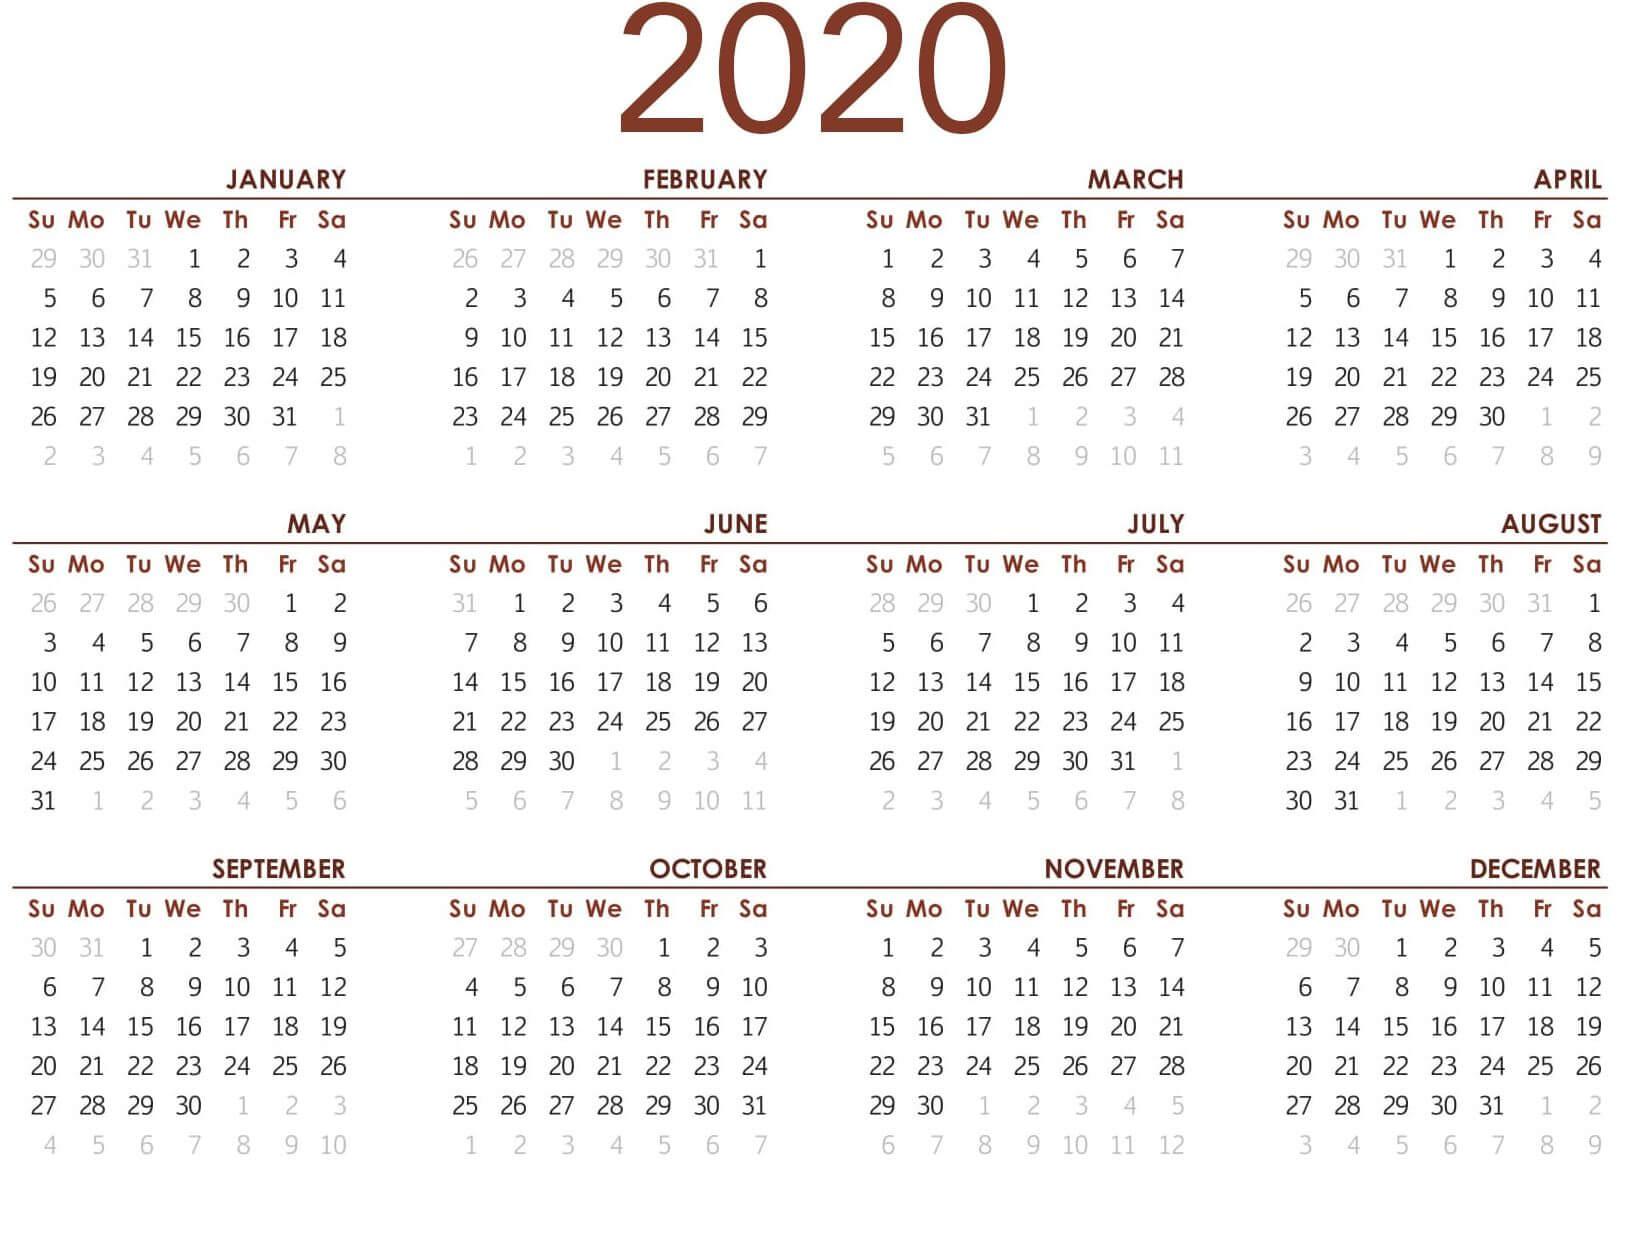 2020 Yearly Calendar Printable PDF